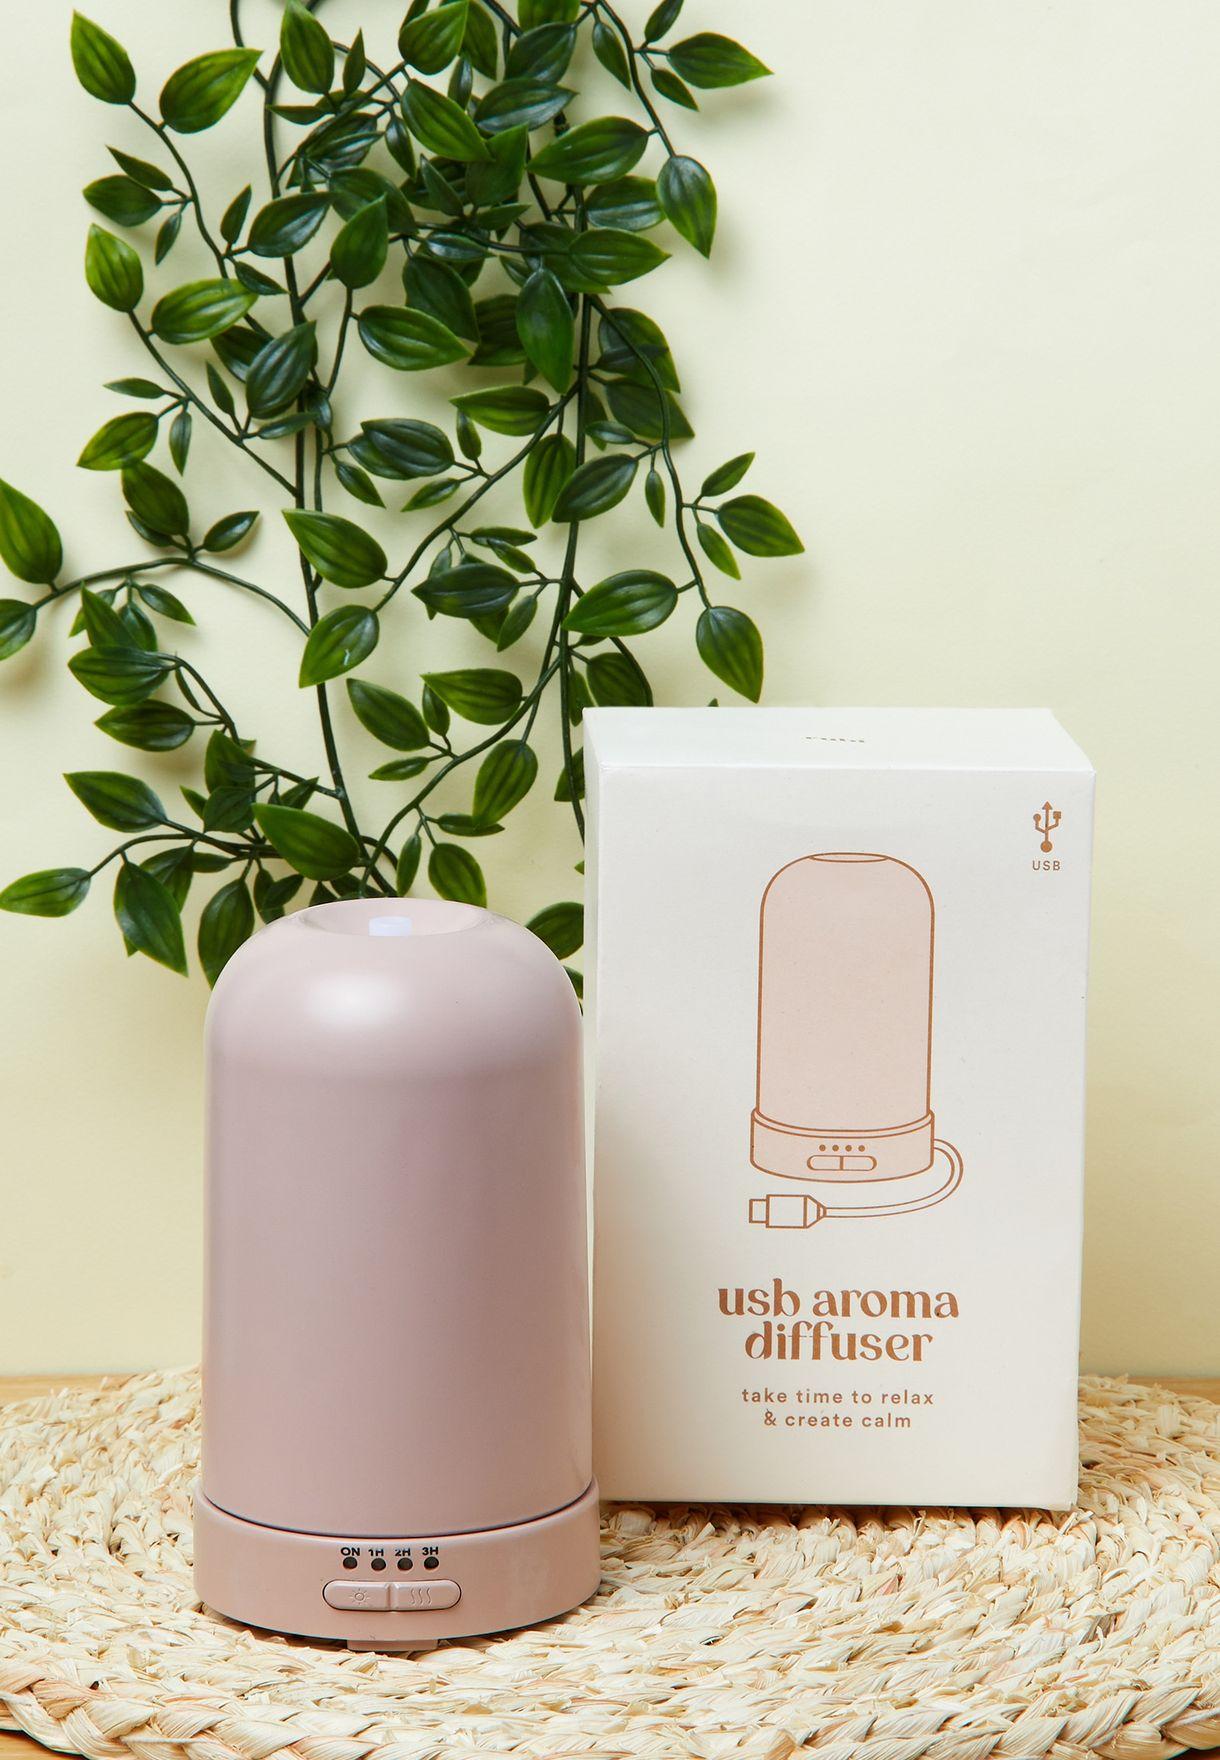 Pink USB Oil Diffuser